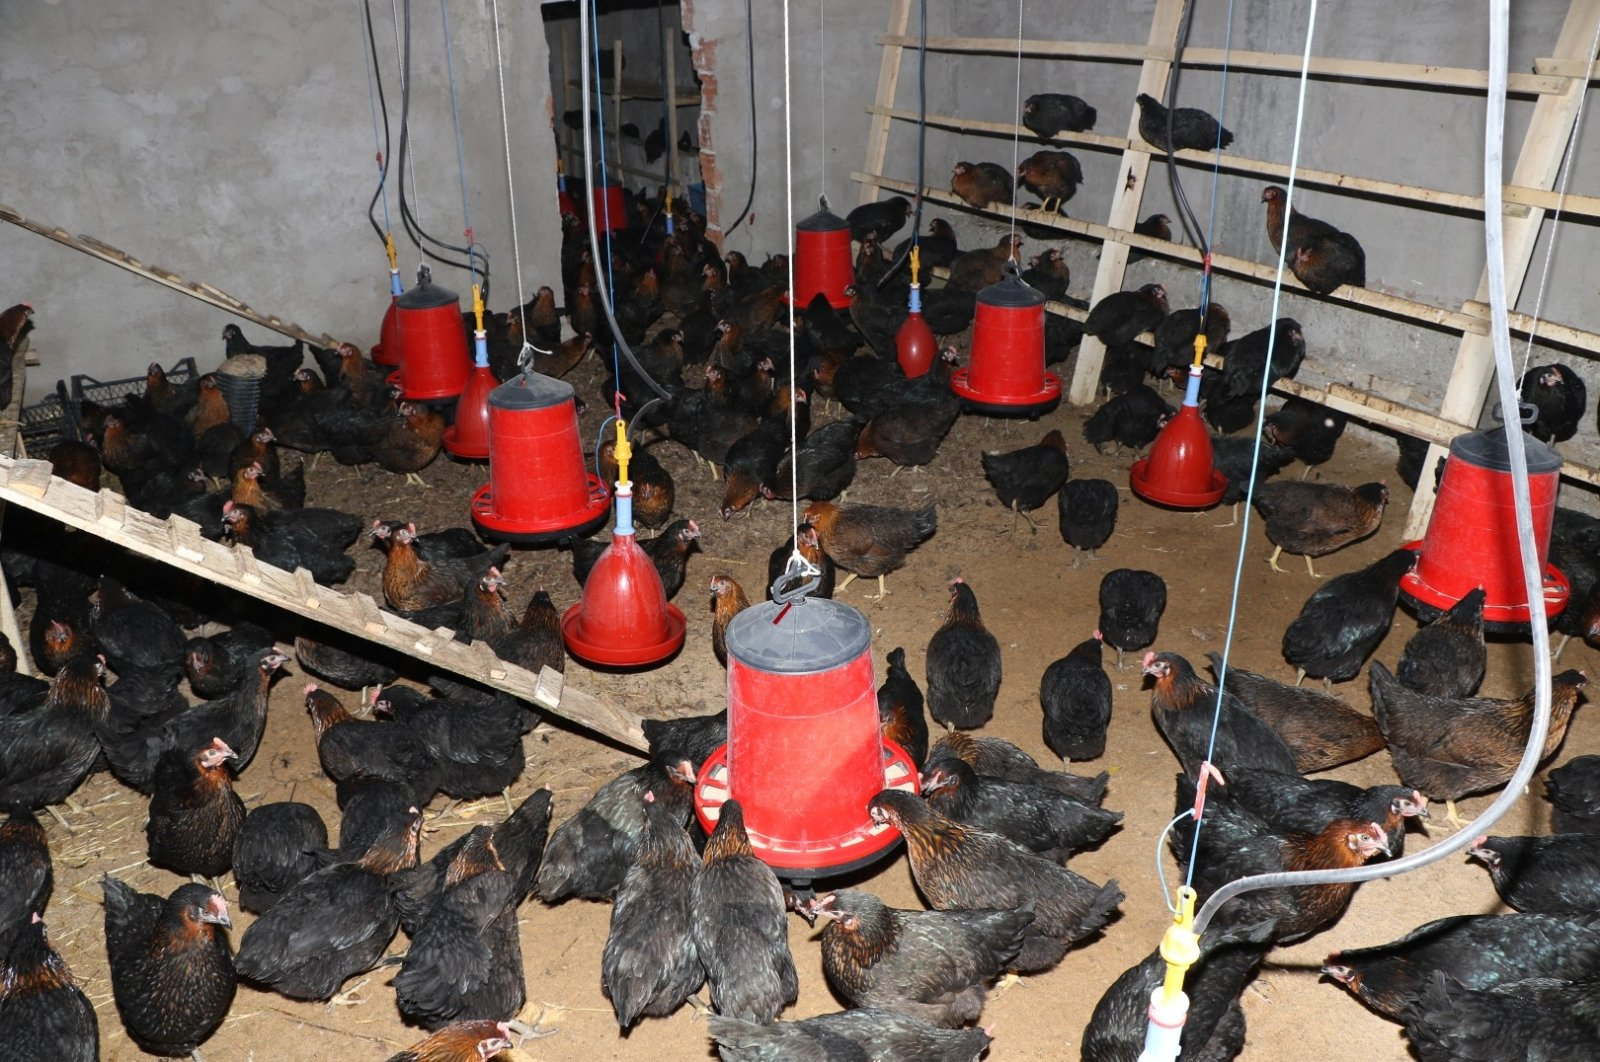 Chickens are seen at a farm in northwestern Kocaeli province, Turkey, April 11, 2020. (AA Photo)